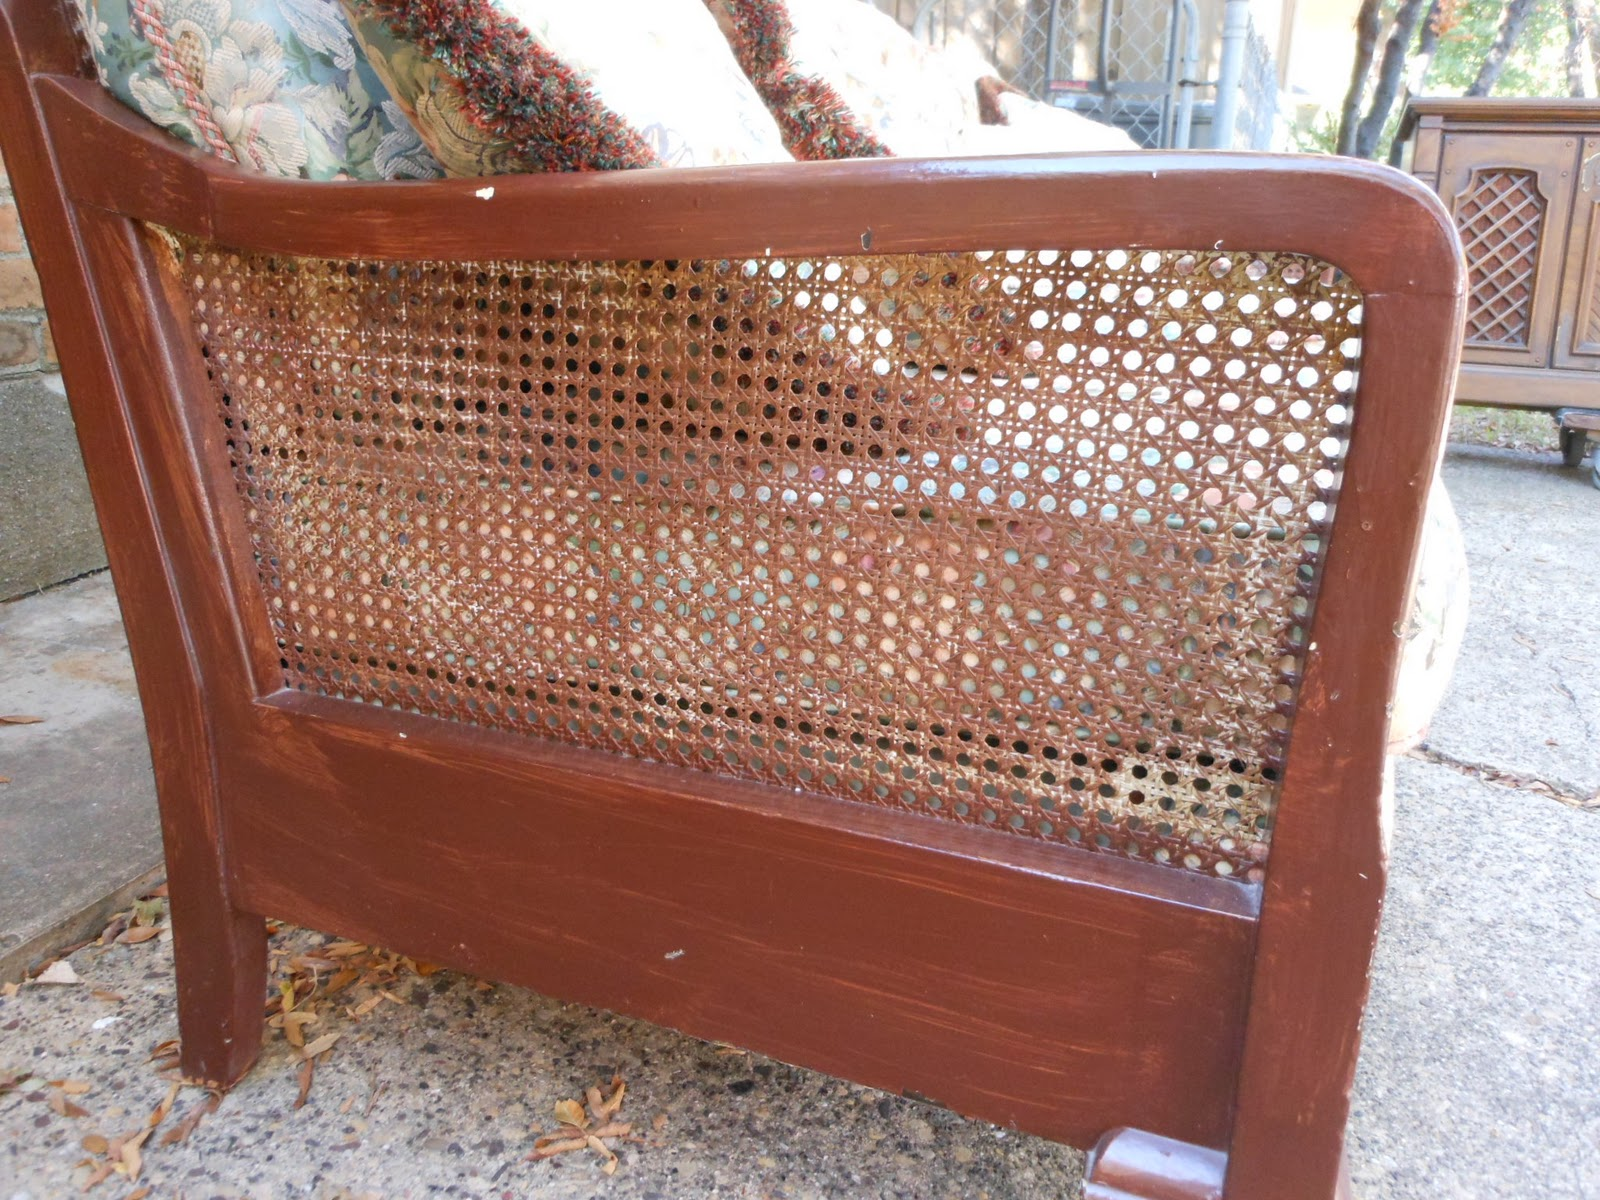 1930 cane back sofa doss fabric microfiber 3 piece sectional antique furniture foter thesofa